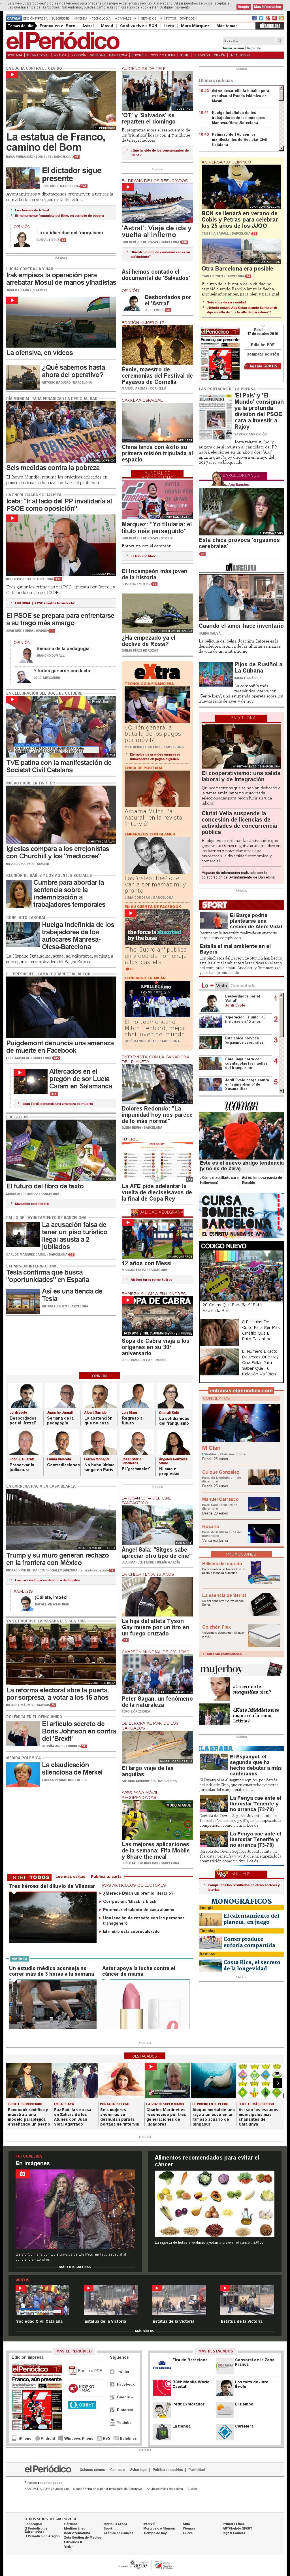 El Periodico at Monday Oct. 17, 2016, 9:12 a.m. UTC